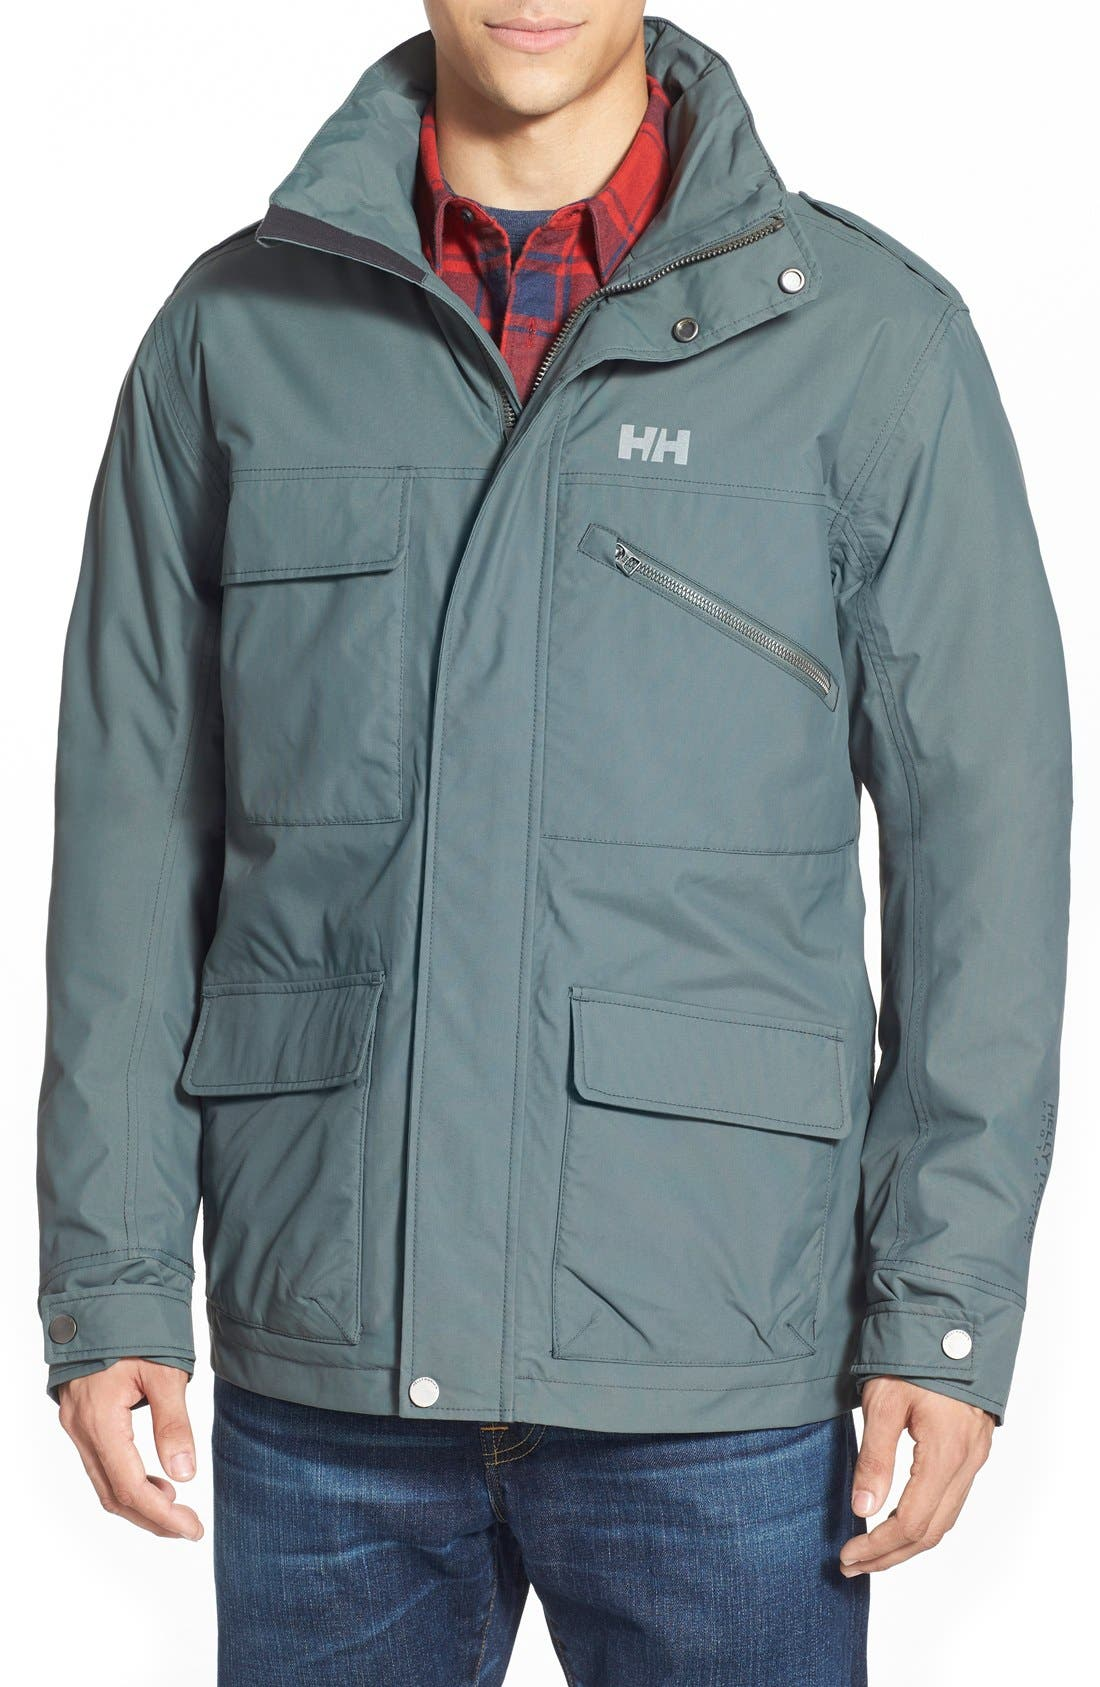 HellyHansen 'Universal' MotoRain Jacket,                         Main,                         color, 080